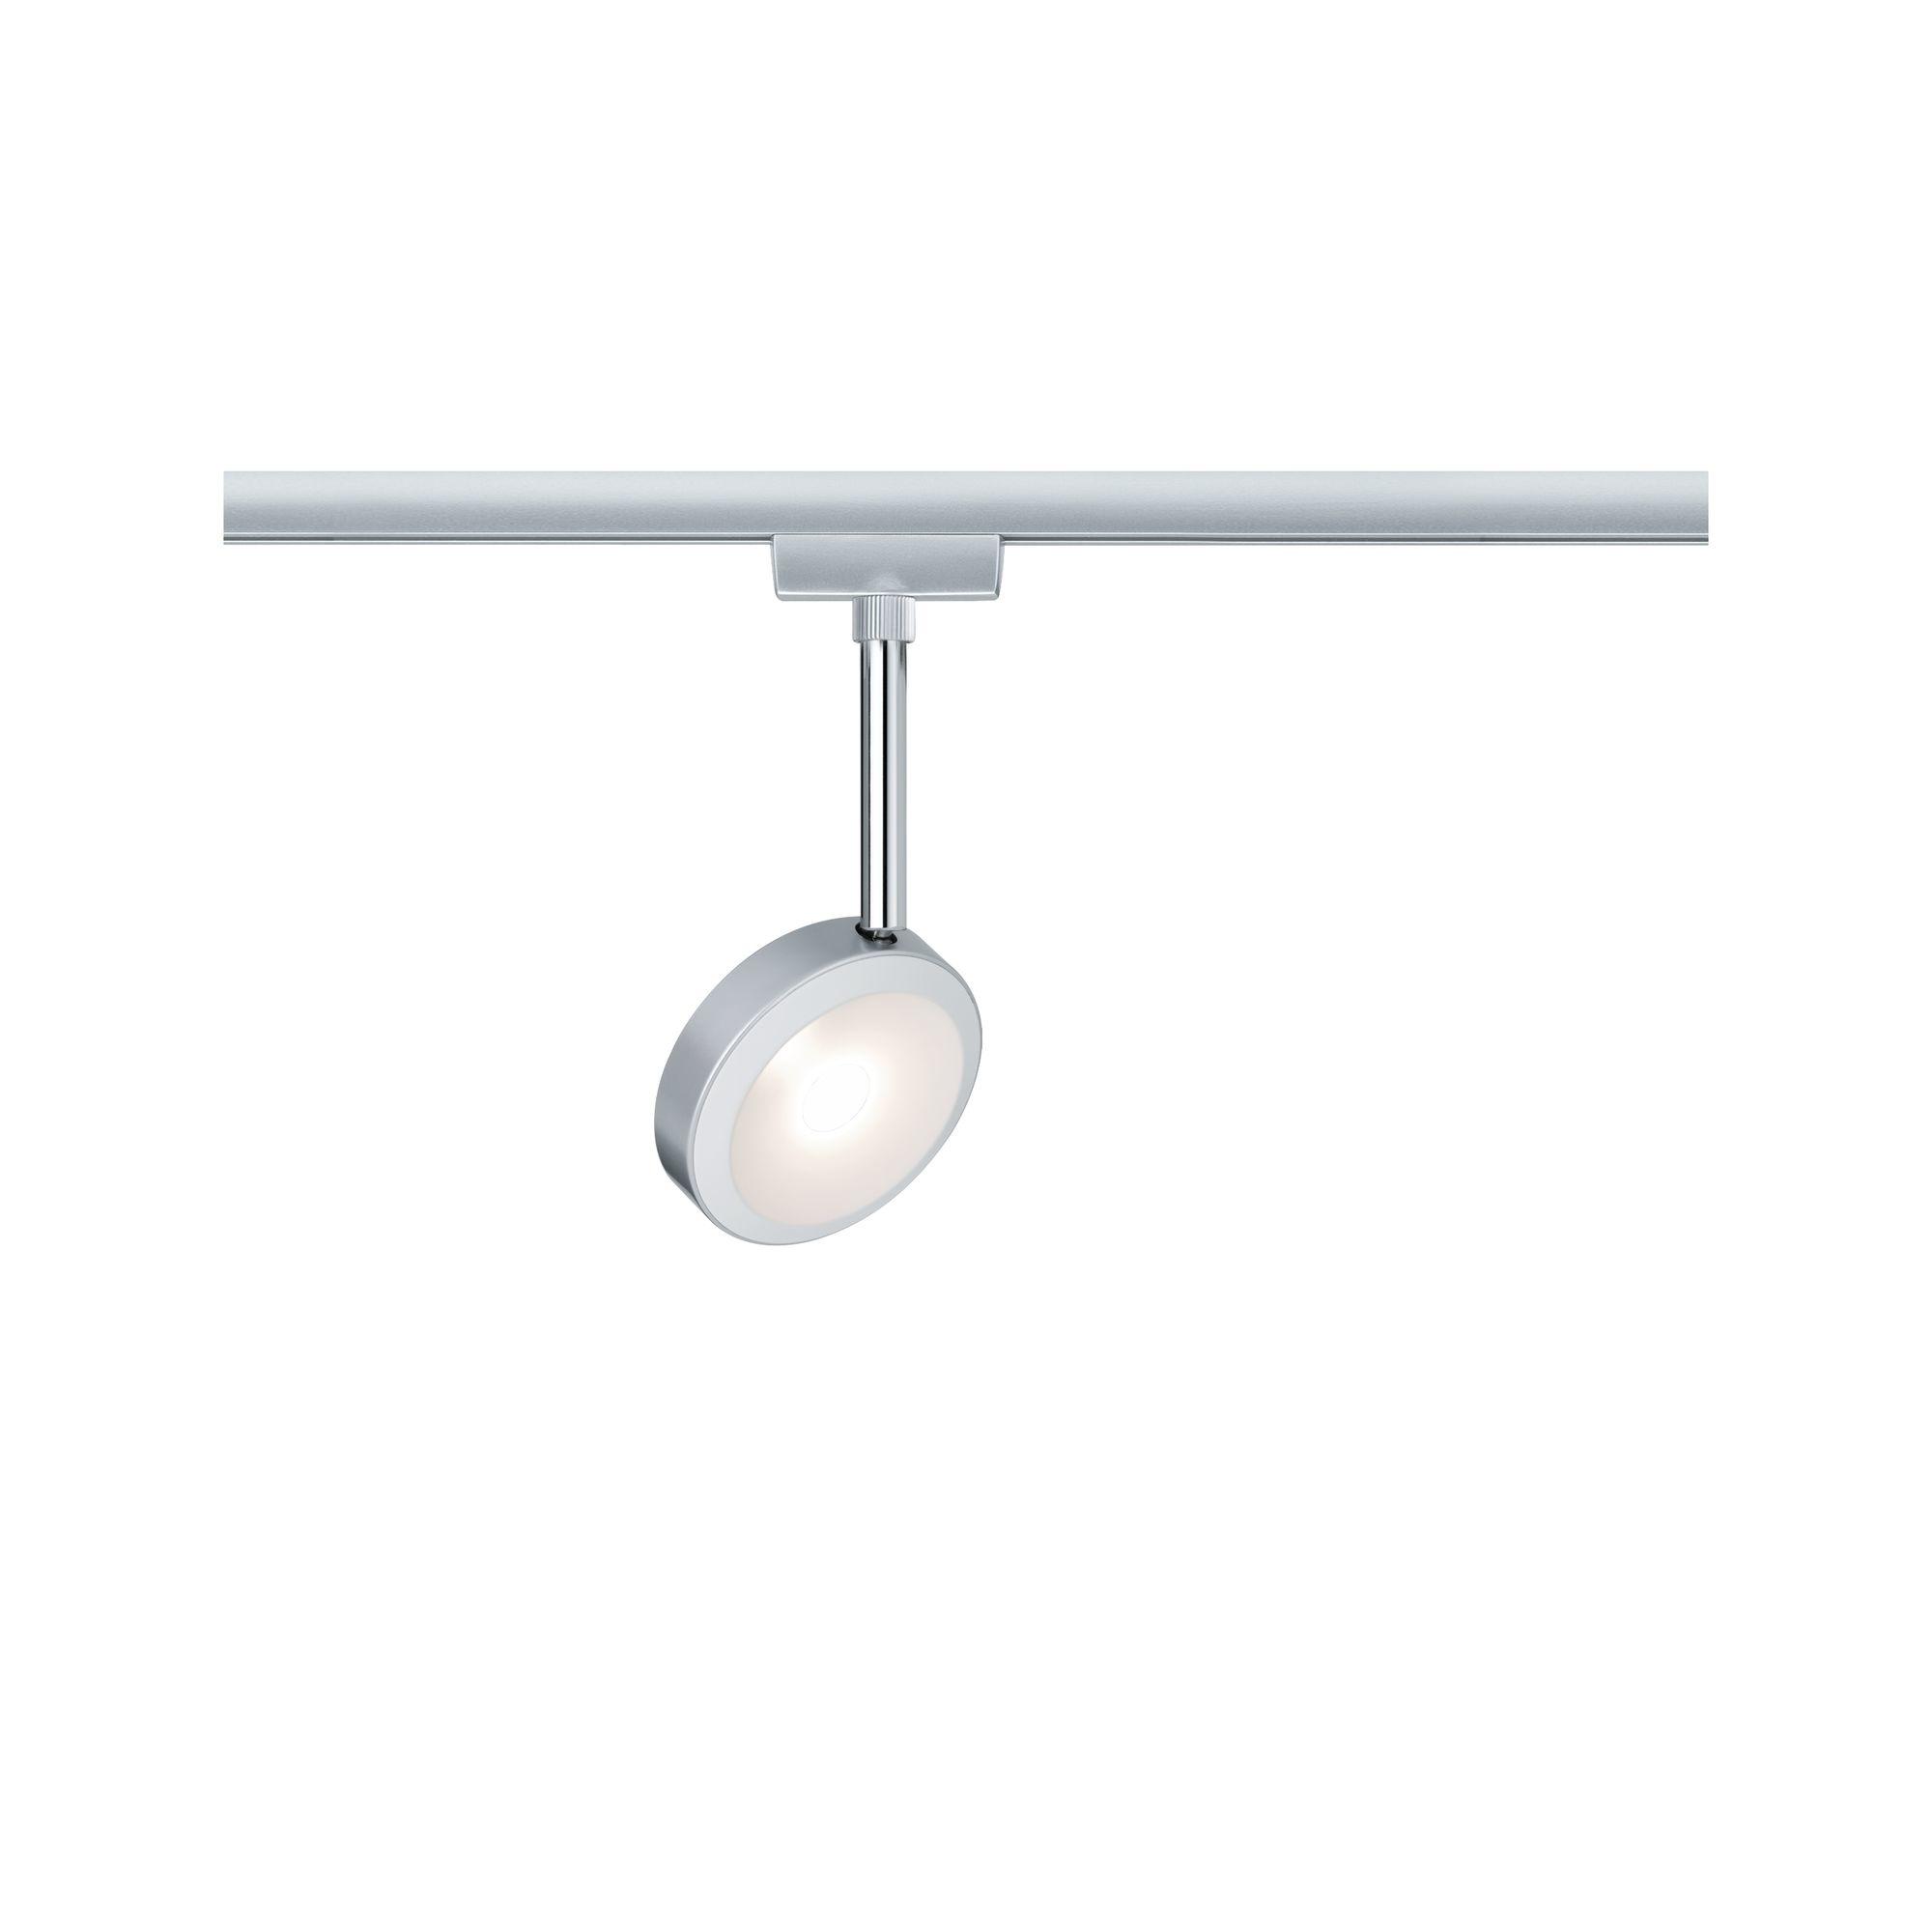 Paulmann URail Spot Discus 1x5W Chrom mattChrom 230V Metall/Kunststoff dimmbar